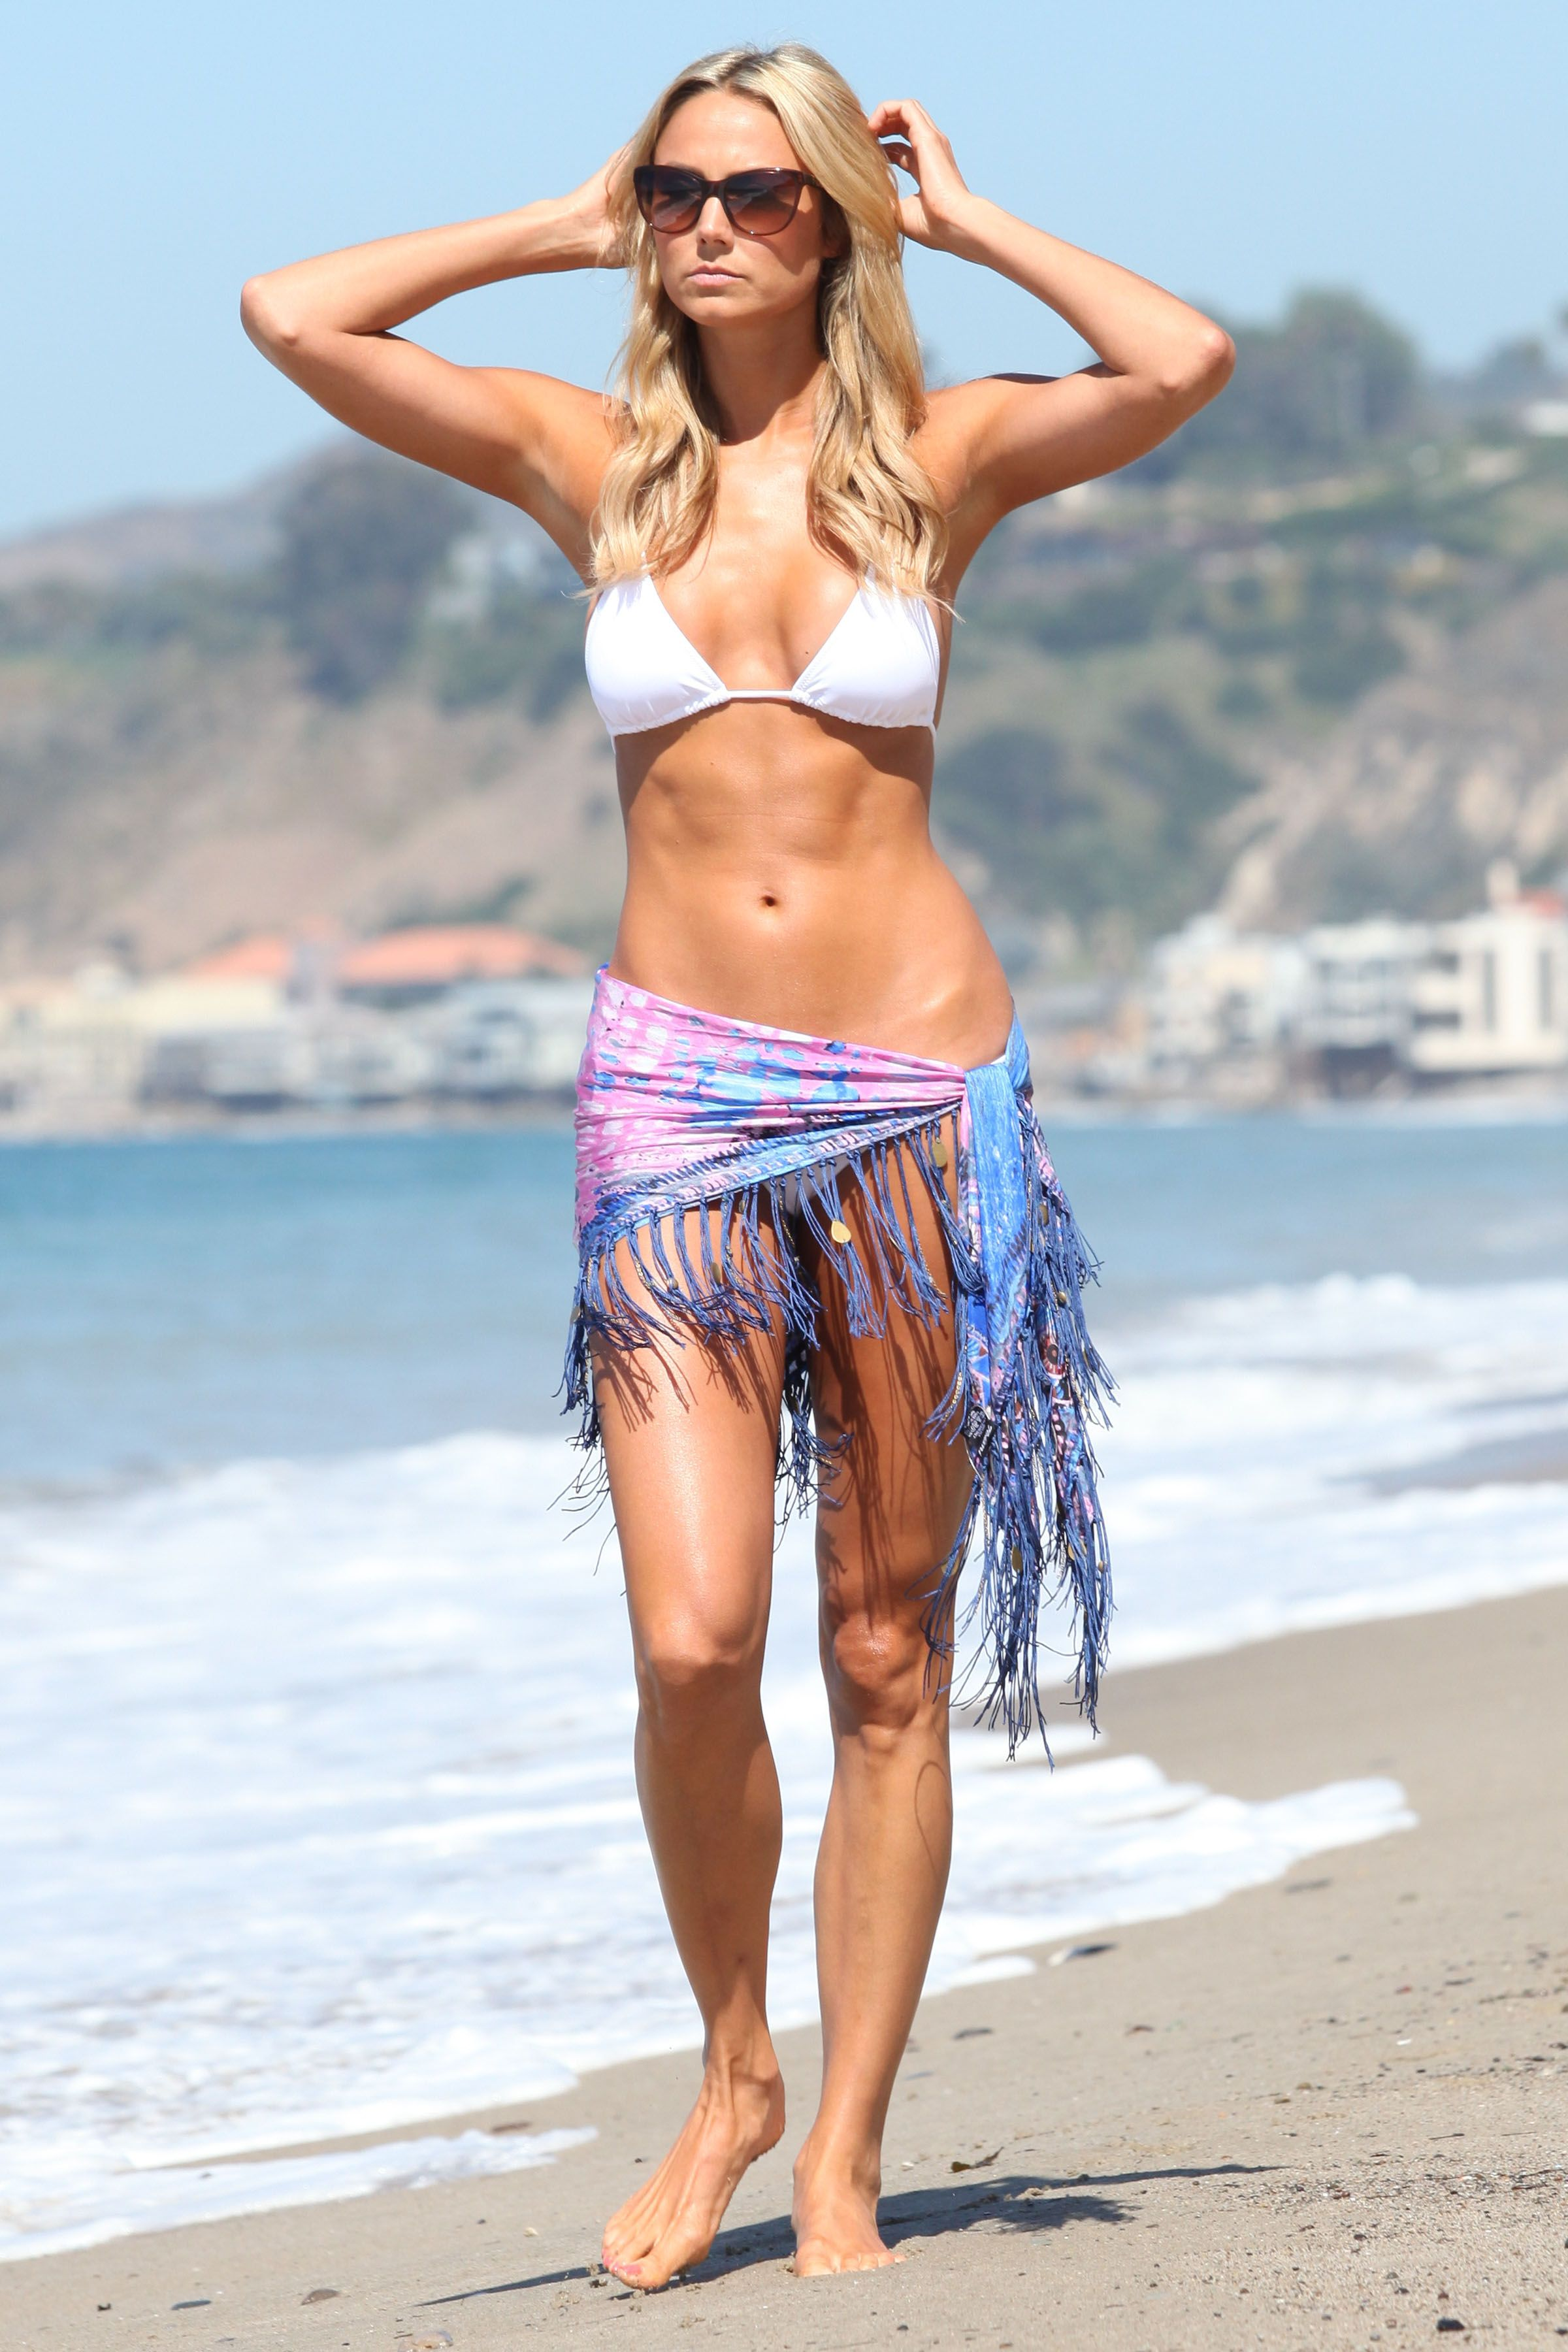 Idea simply Stacy keibler bikini simply